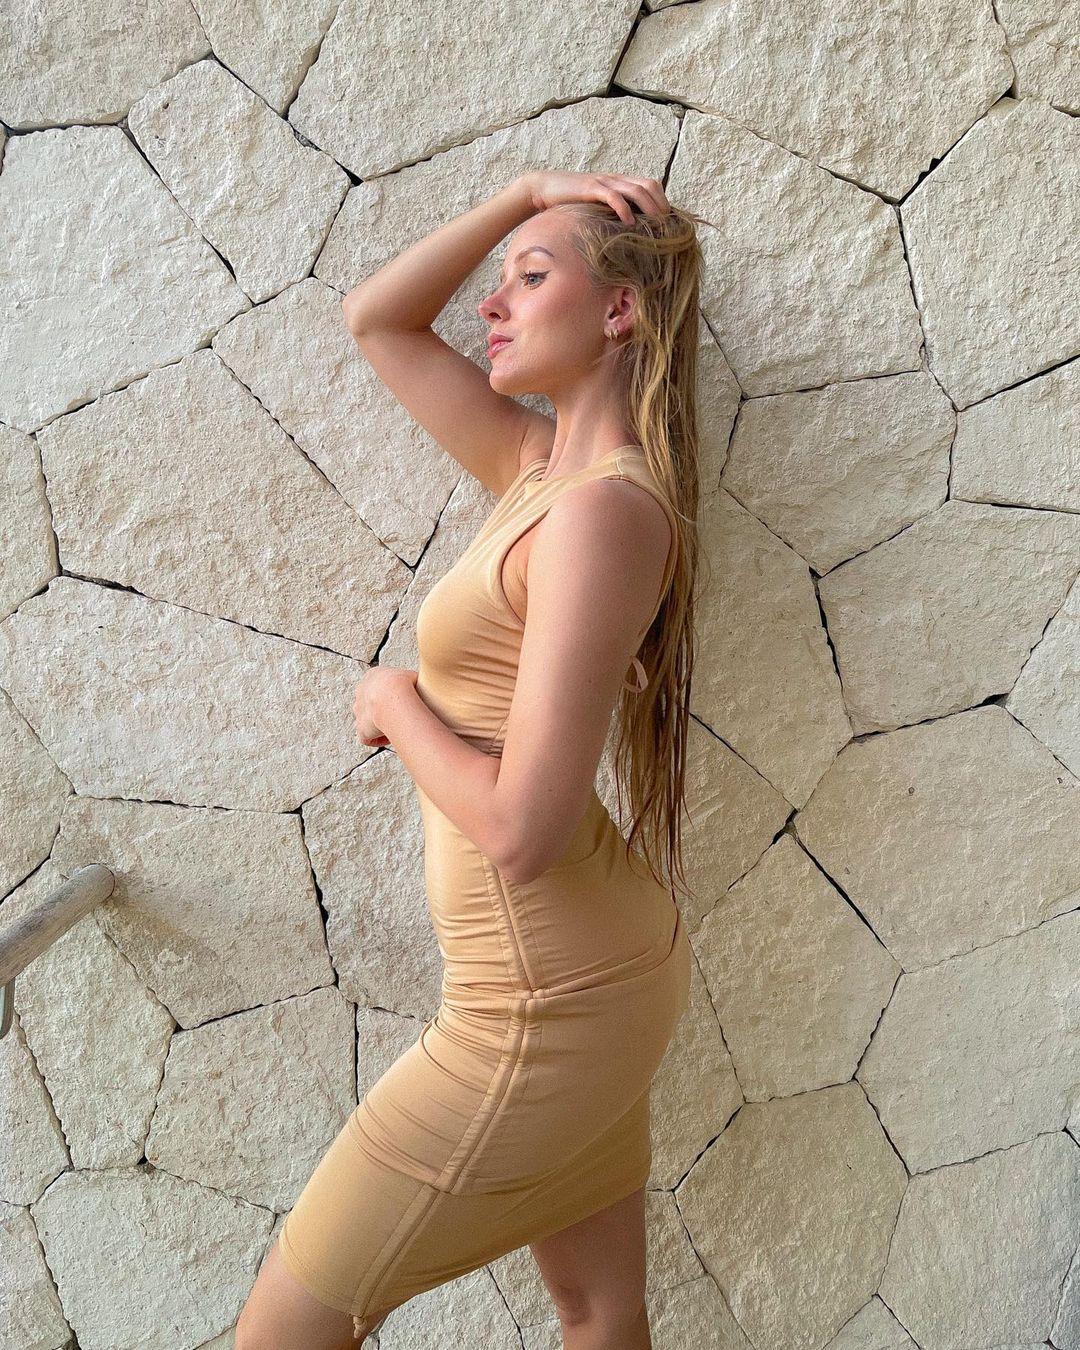 Caroline-Zalog-Wallpapers-Insta-Fit-Bio-1